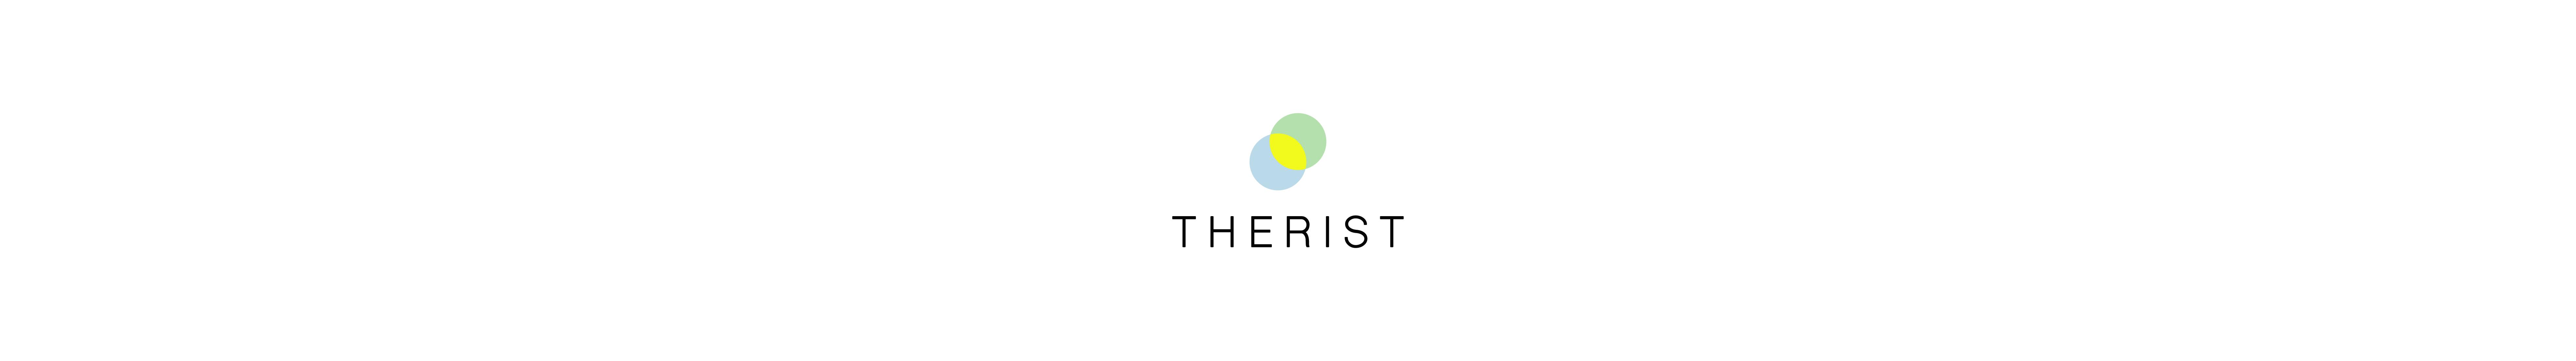 THERIST